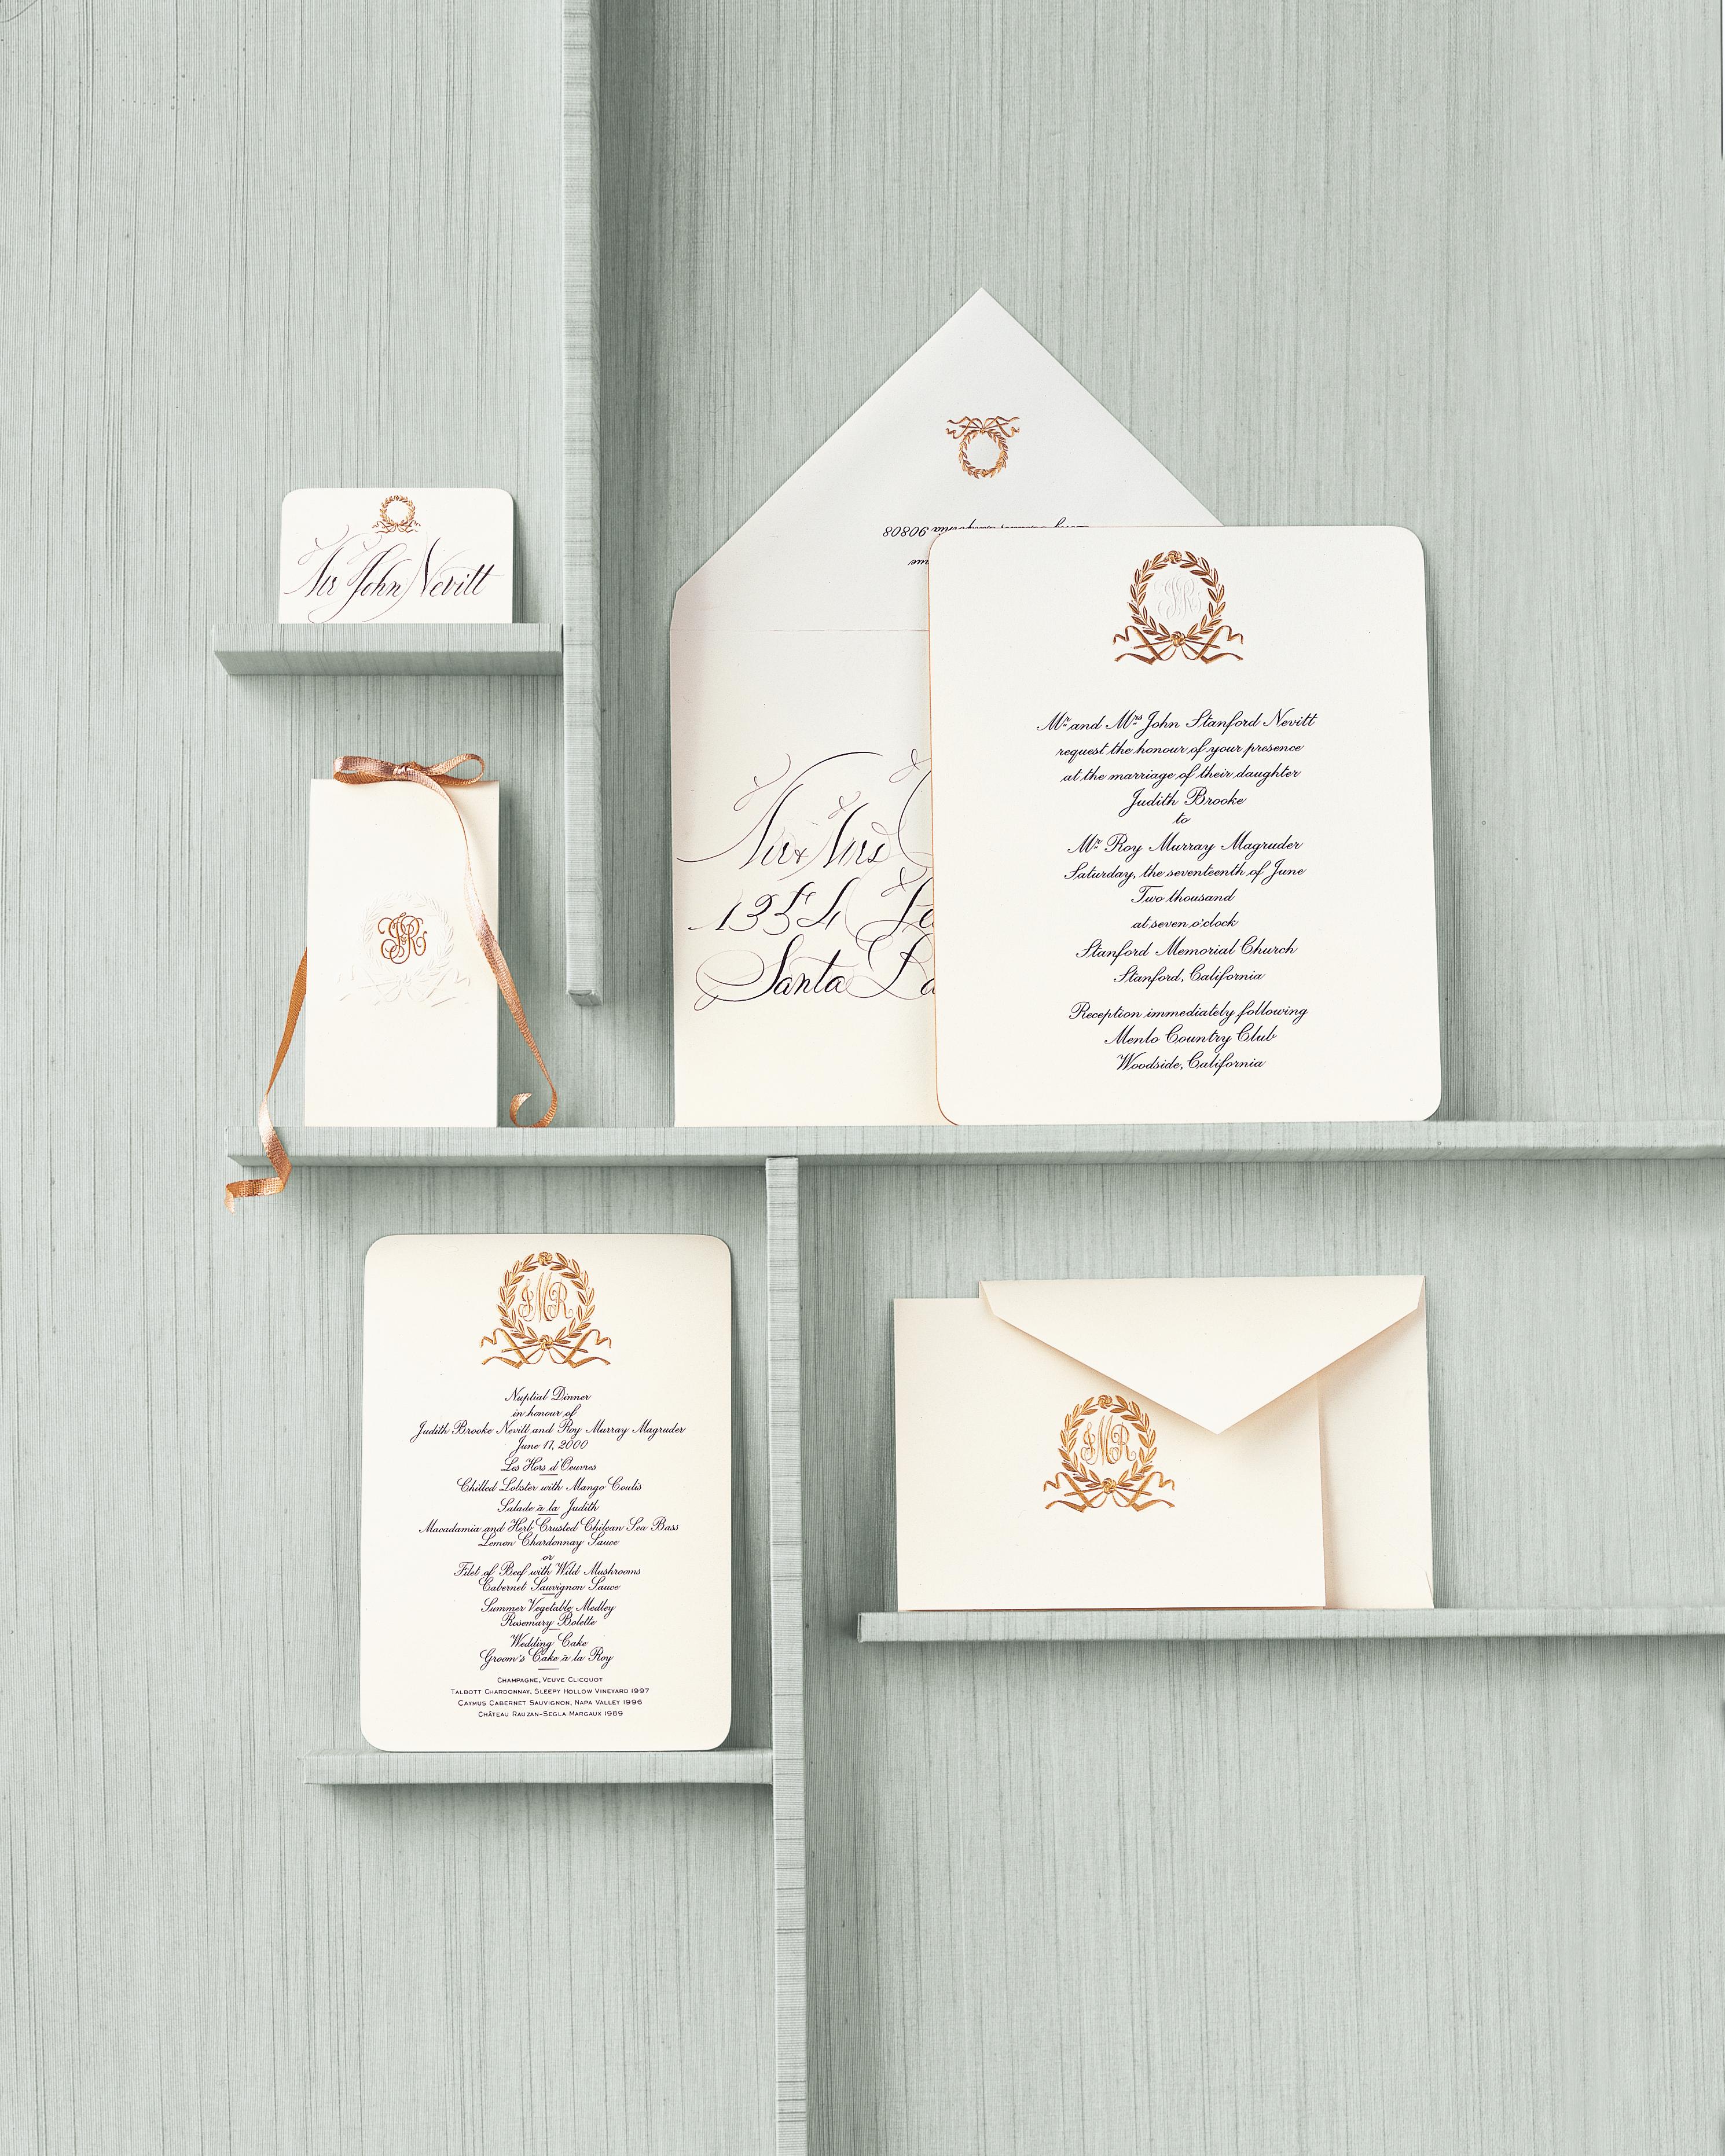 margo-me-martha-inspiration-gold-stationery-suite-details-wi08-0515.jpg